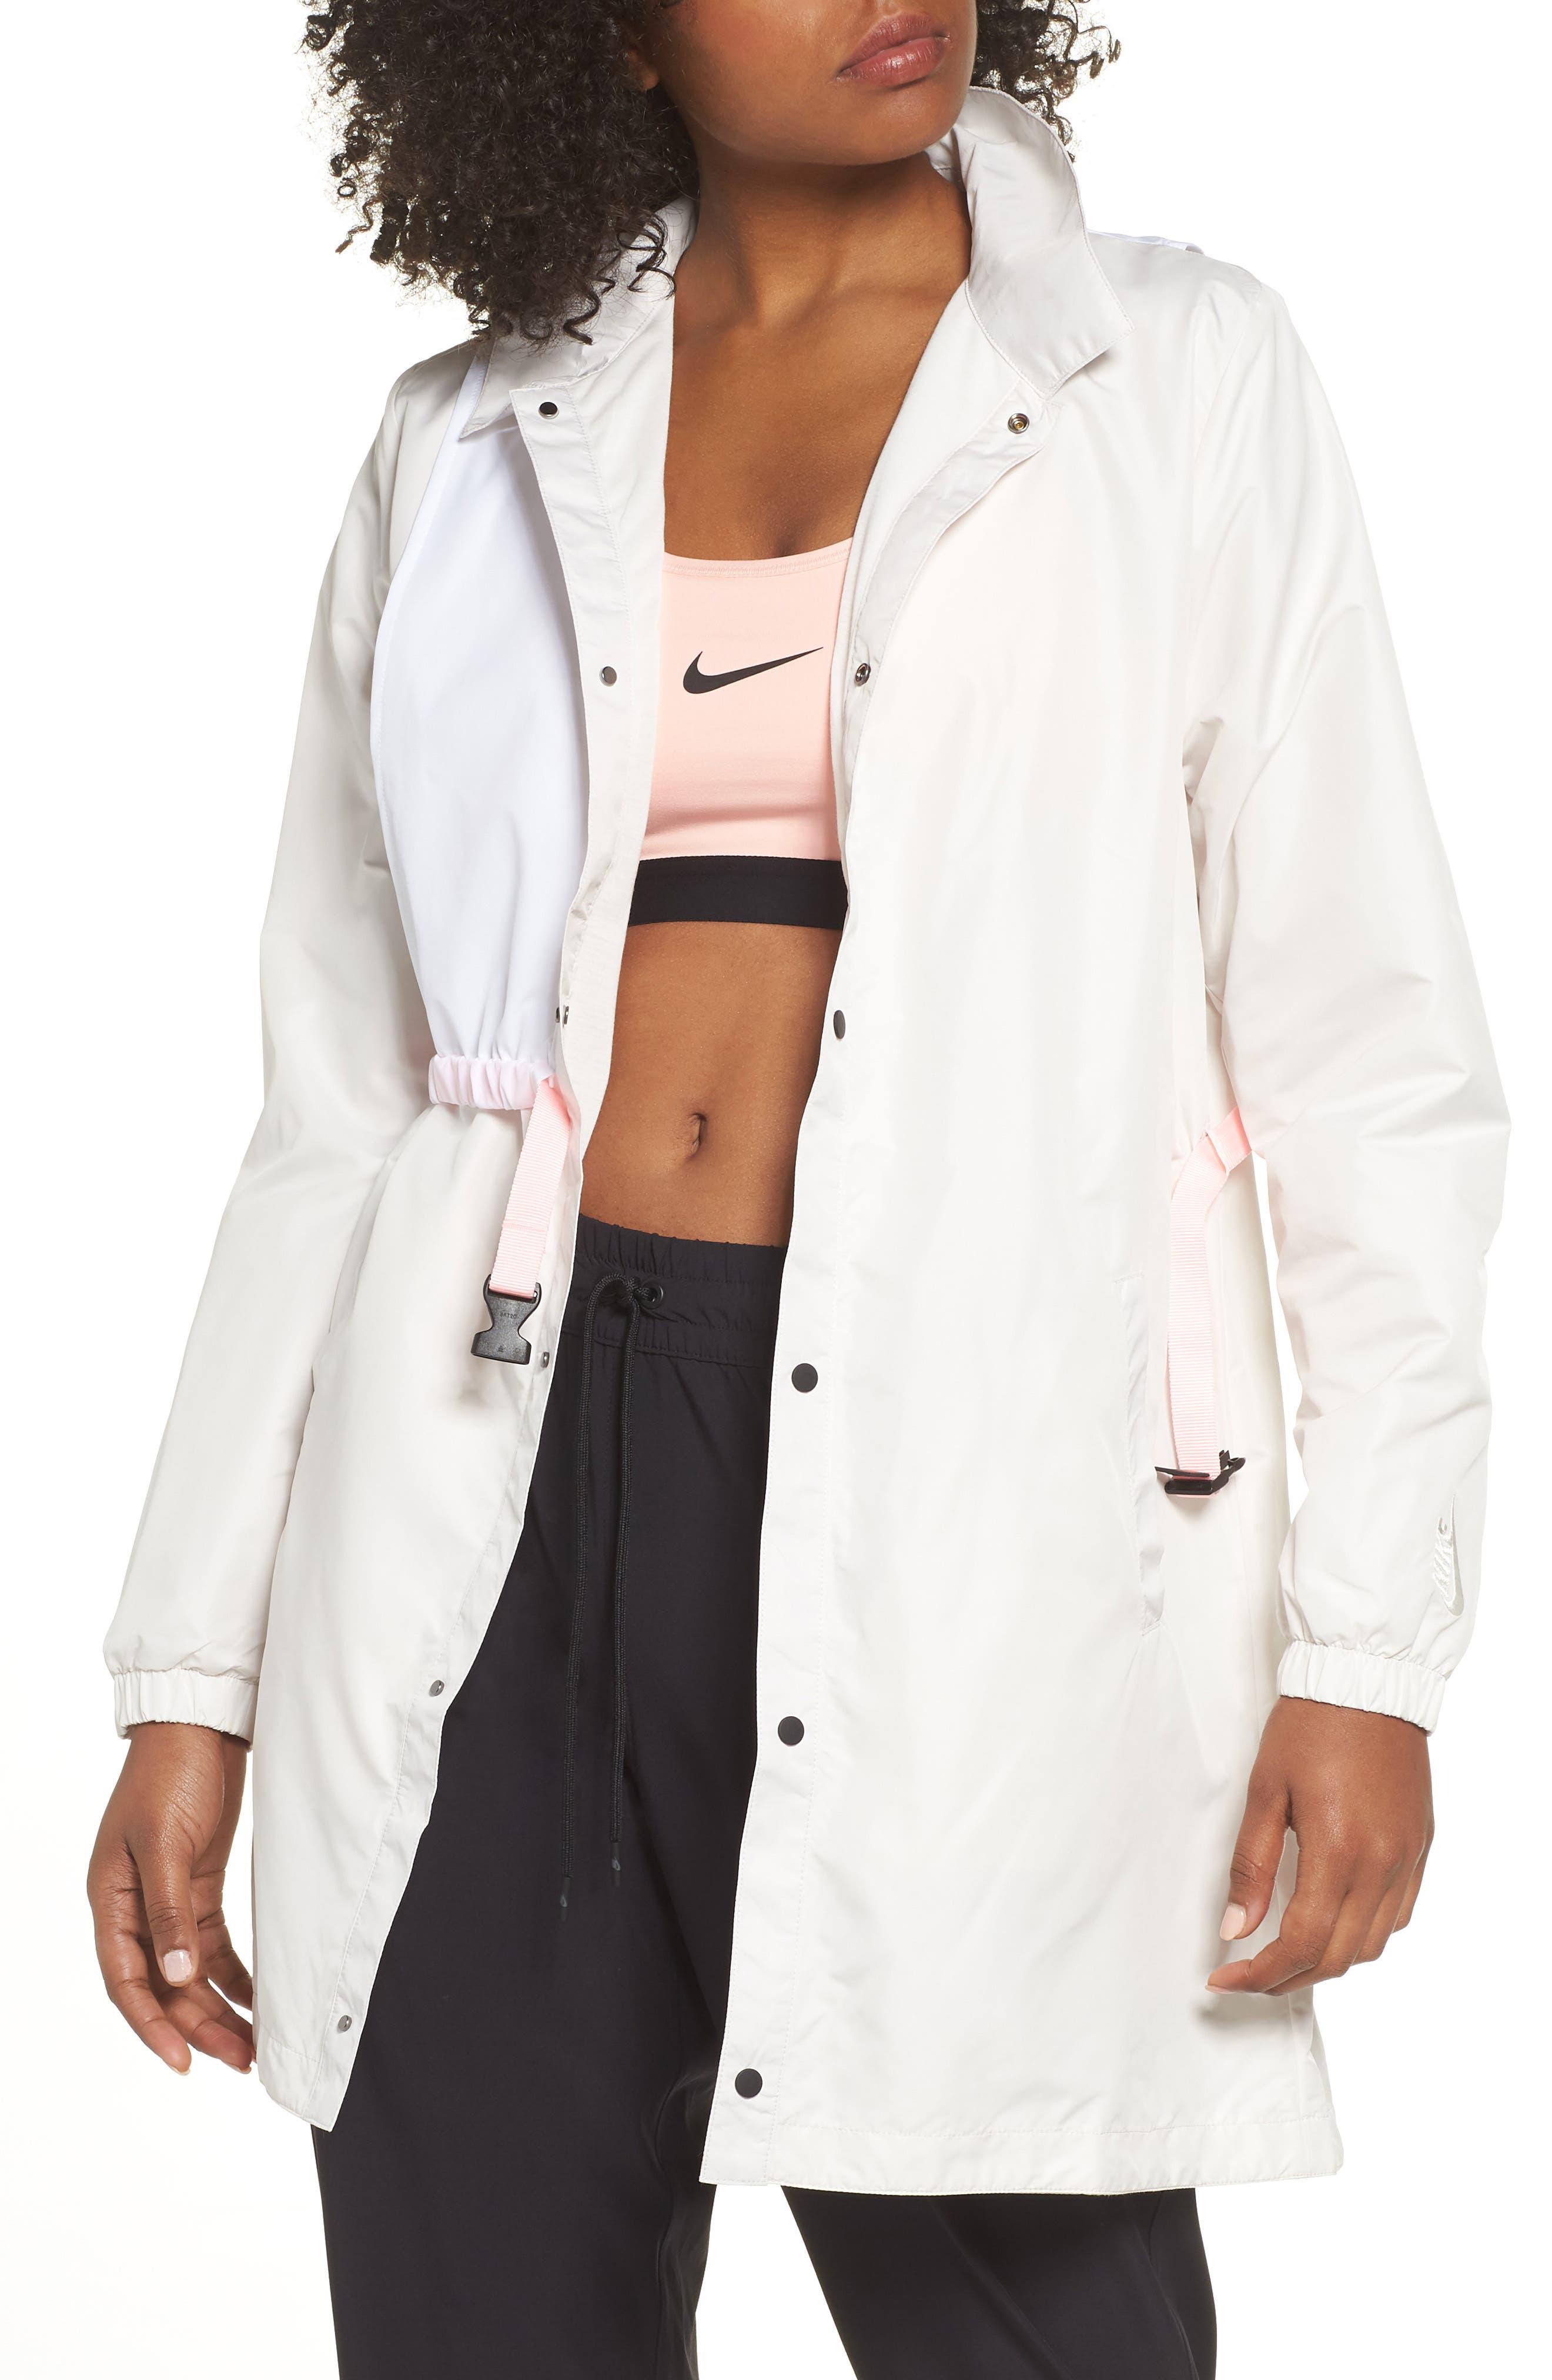 Hybrid Coaches Jacket/Dress,                             Main thumbnail 1, color,                             PHANTOM/ WHITE/ ARCTIC PUNCH